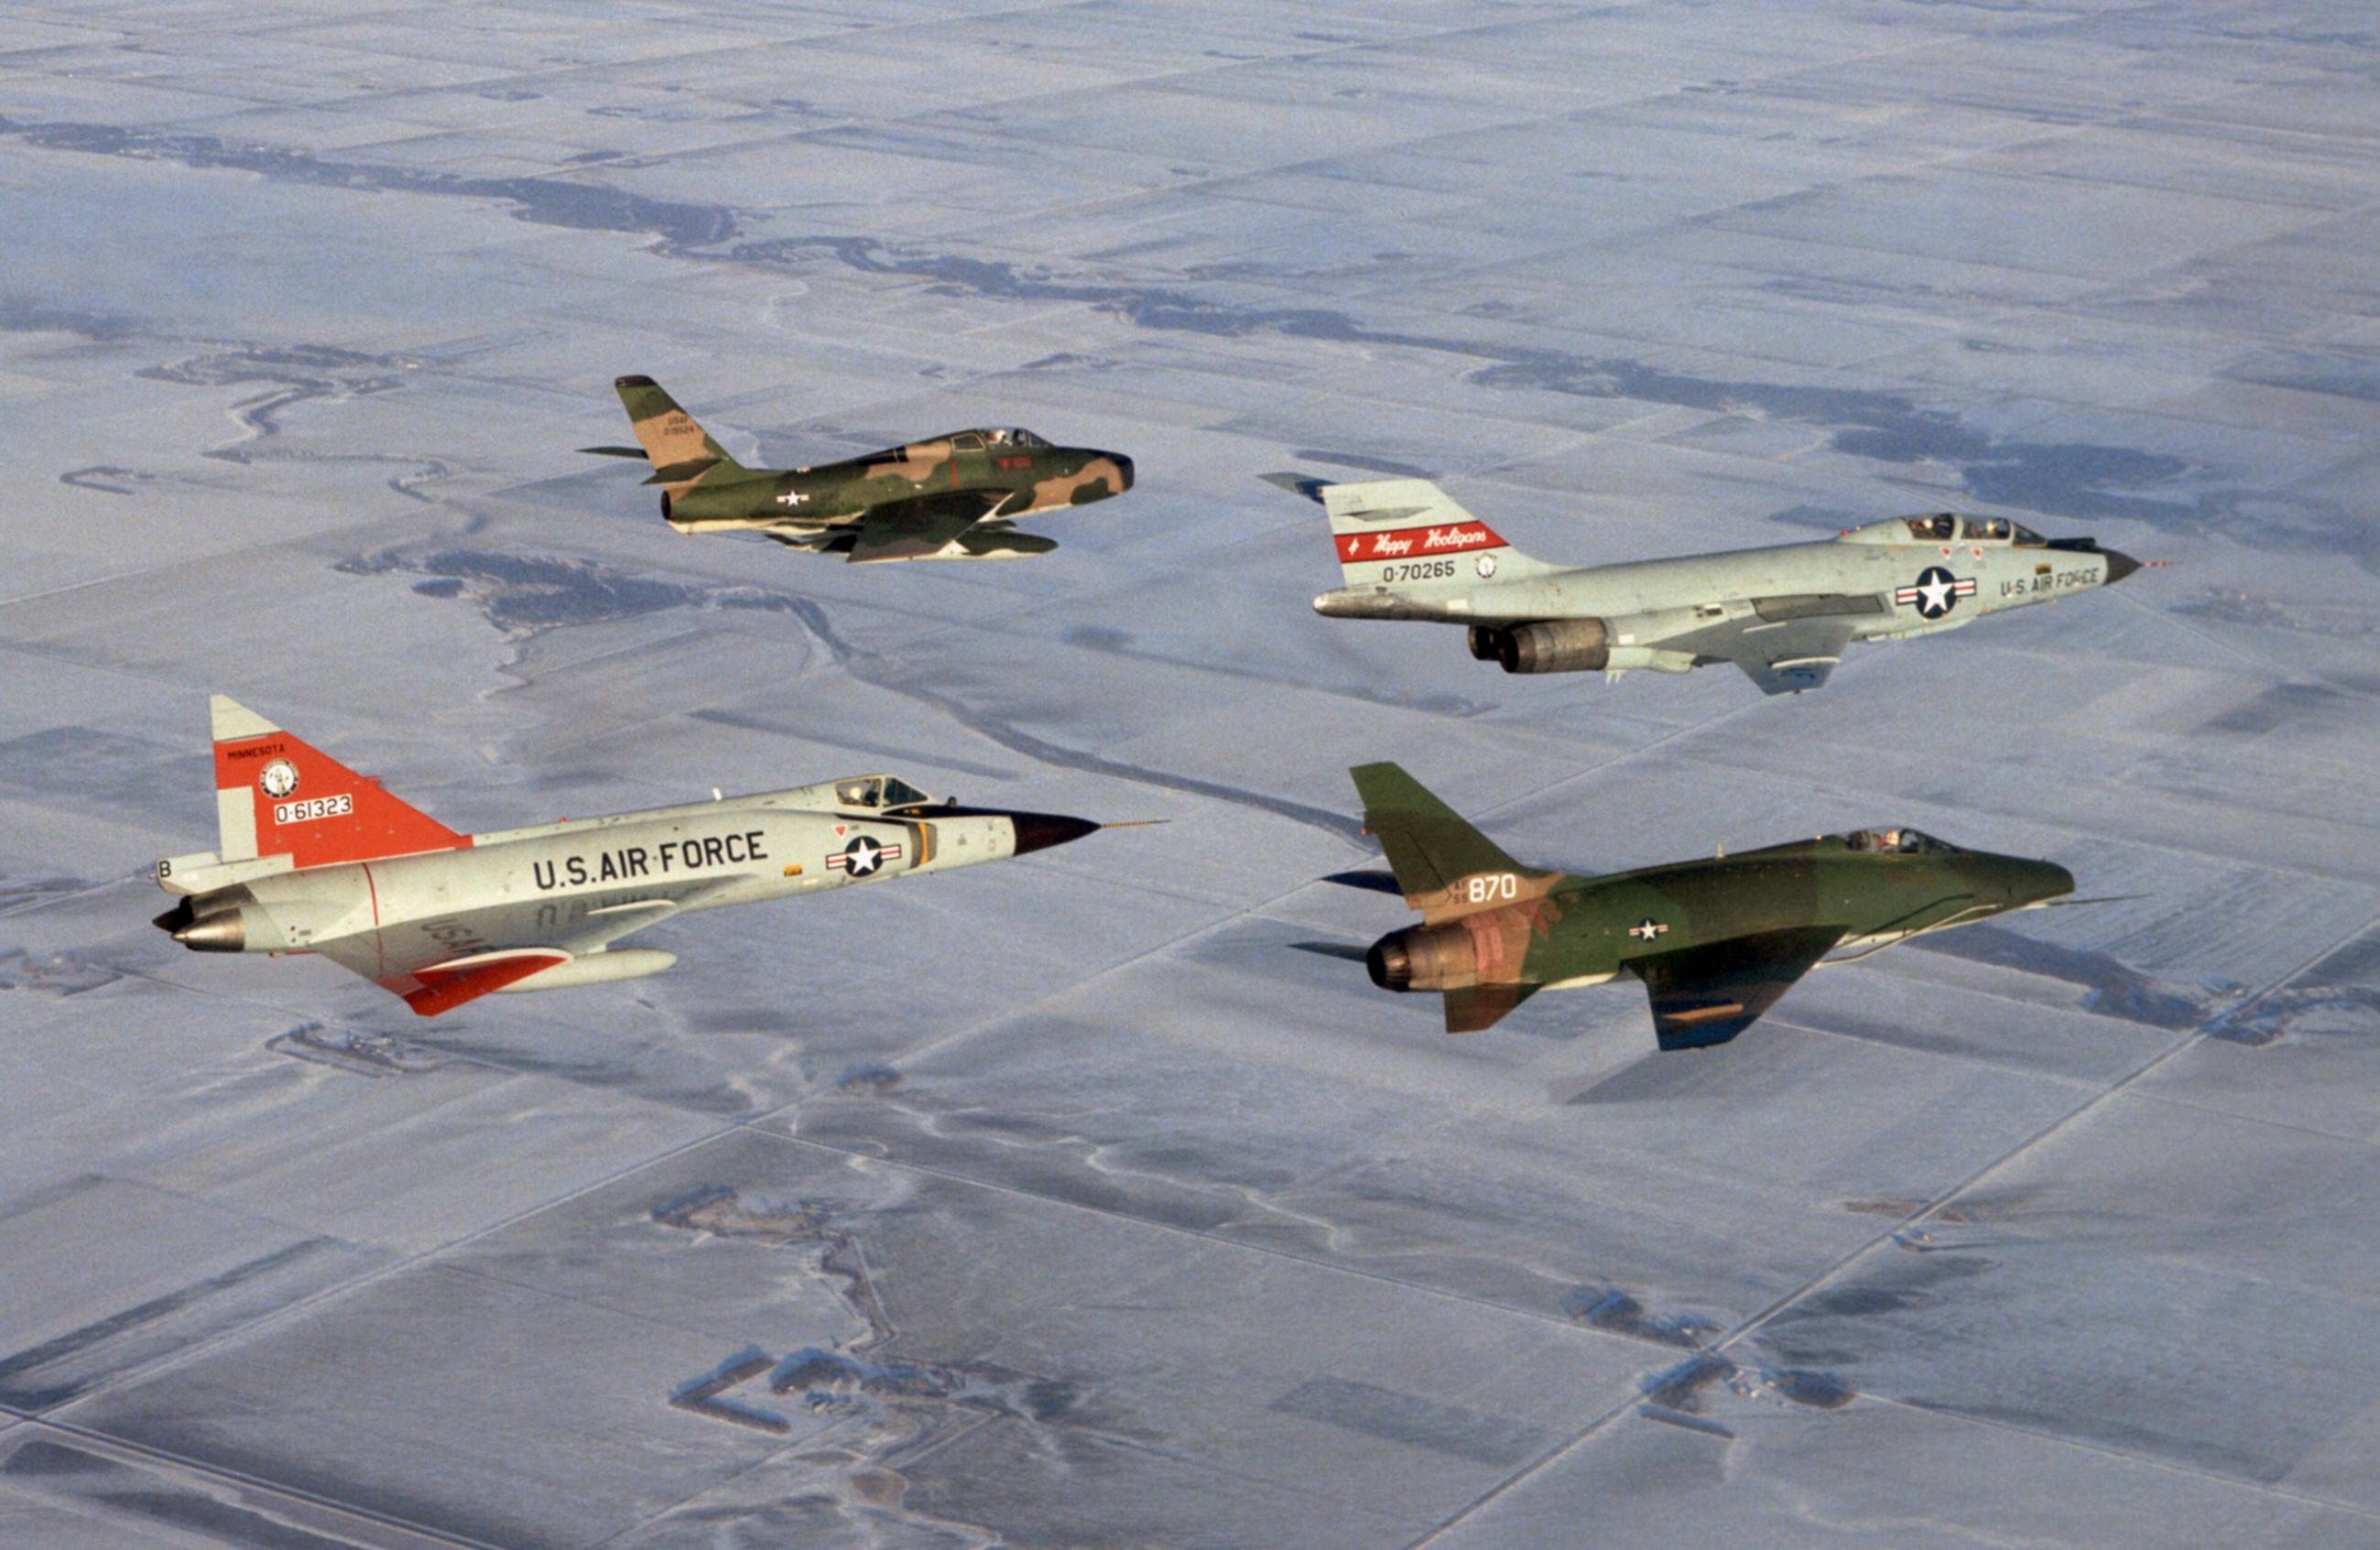 F-100 Super Sabre: a fighter pilot's perspective